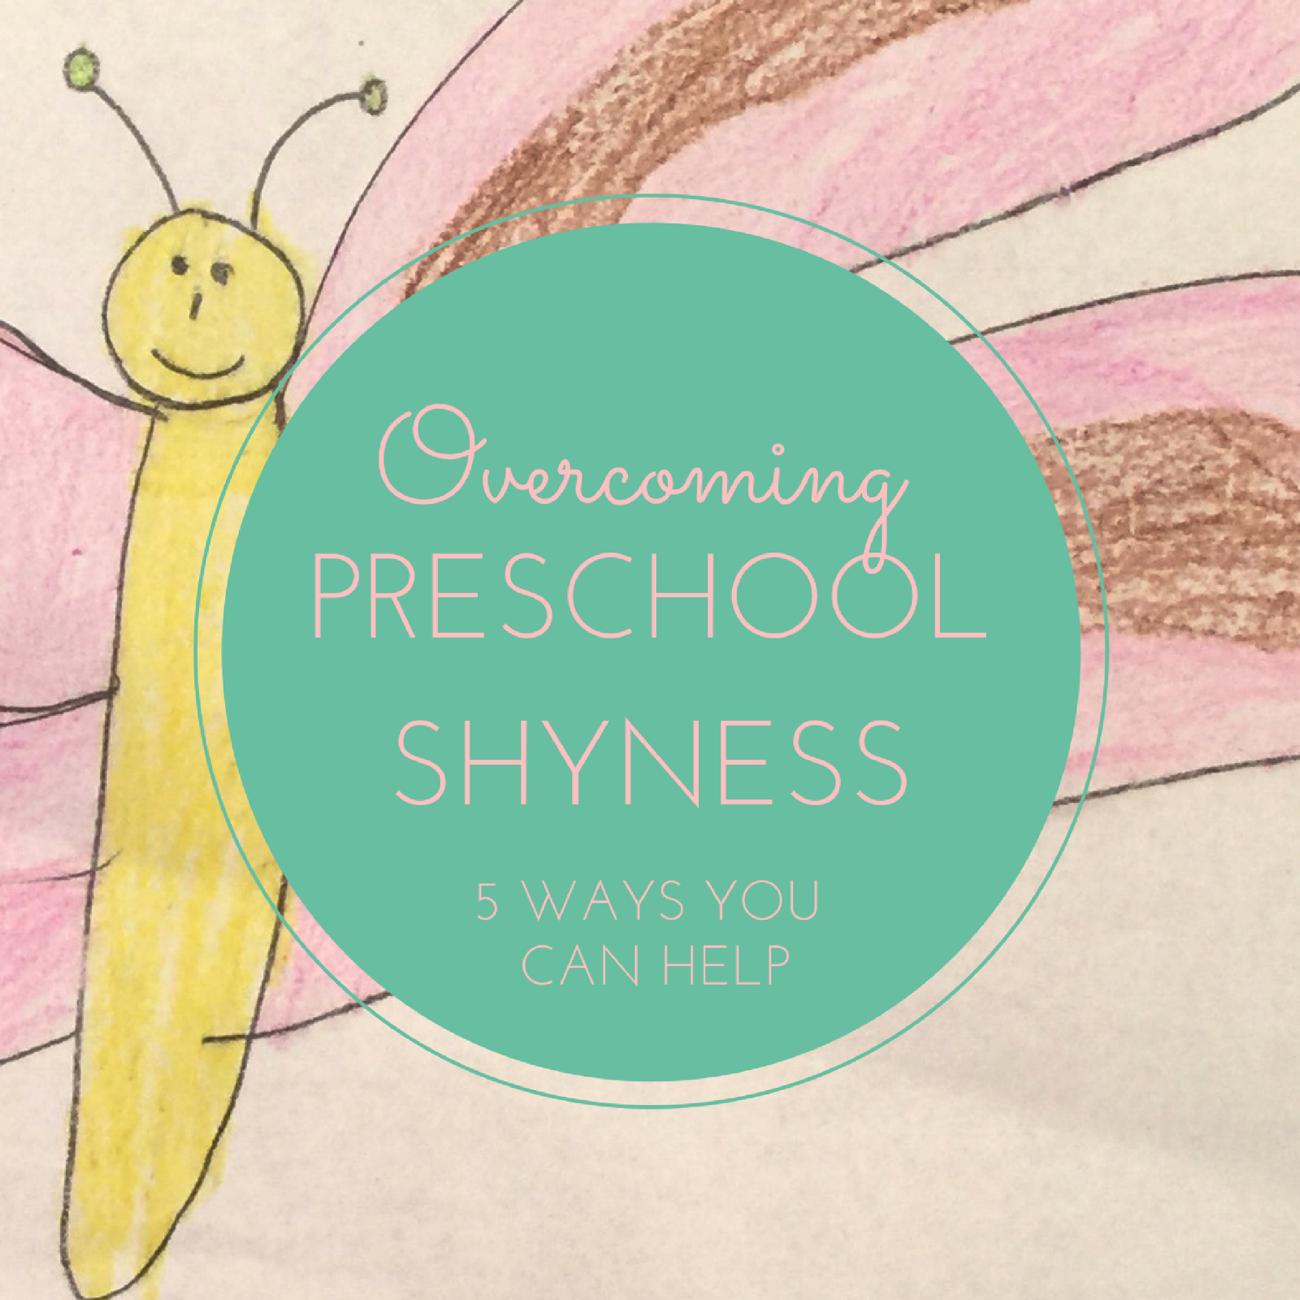 overcomoing_preschool_shyness.png